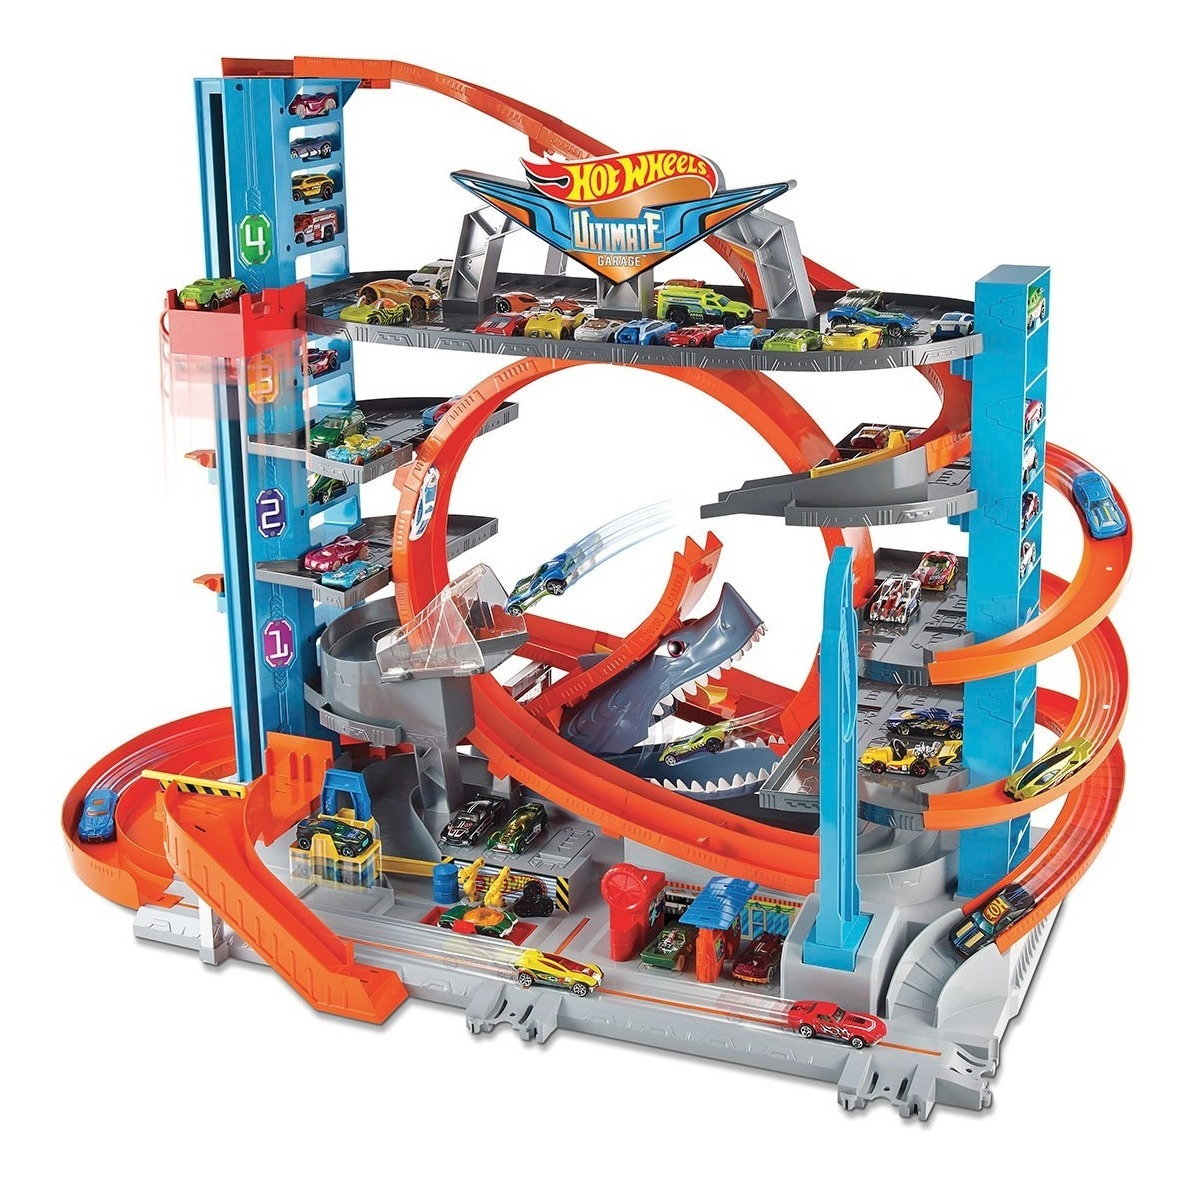 Hot Wheels Mega Garage Ultimate City Mattel